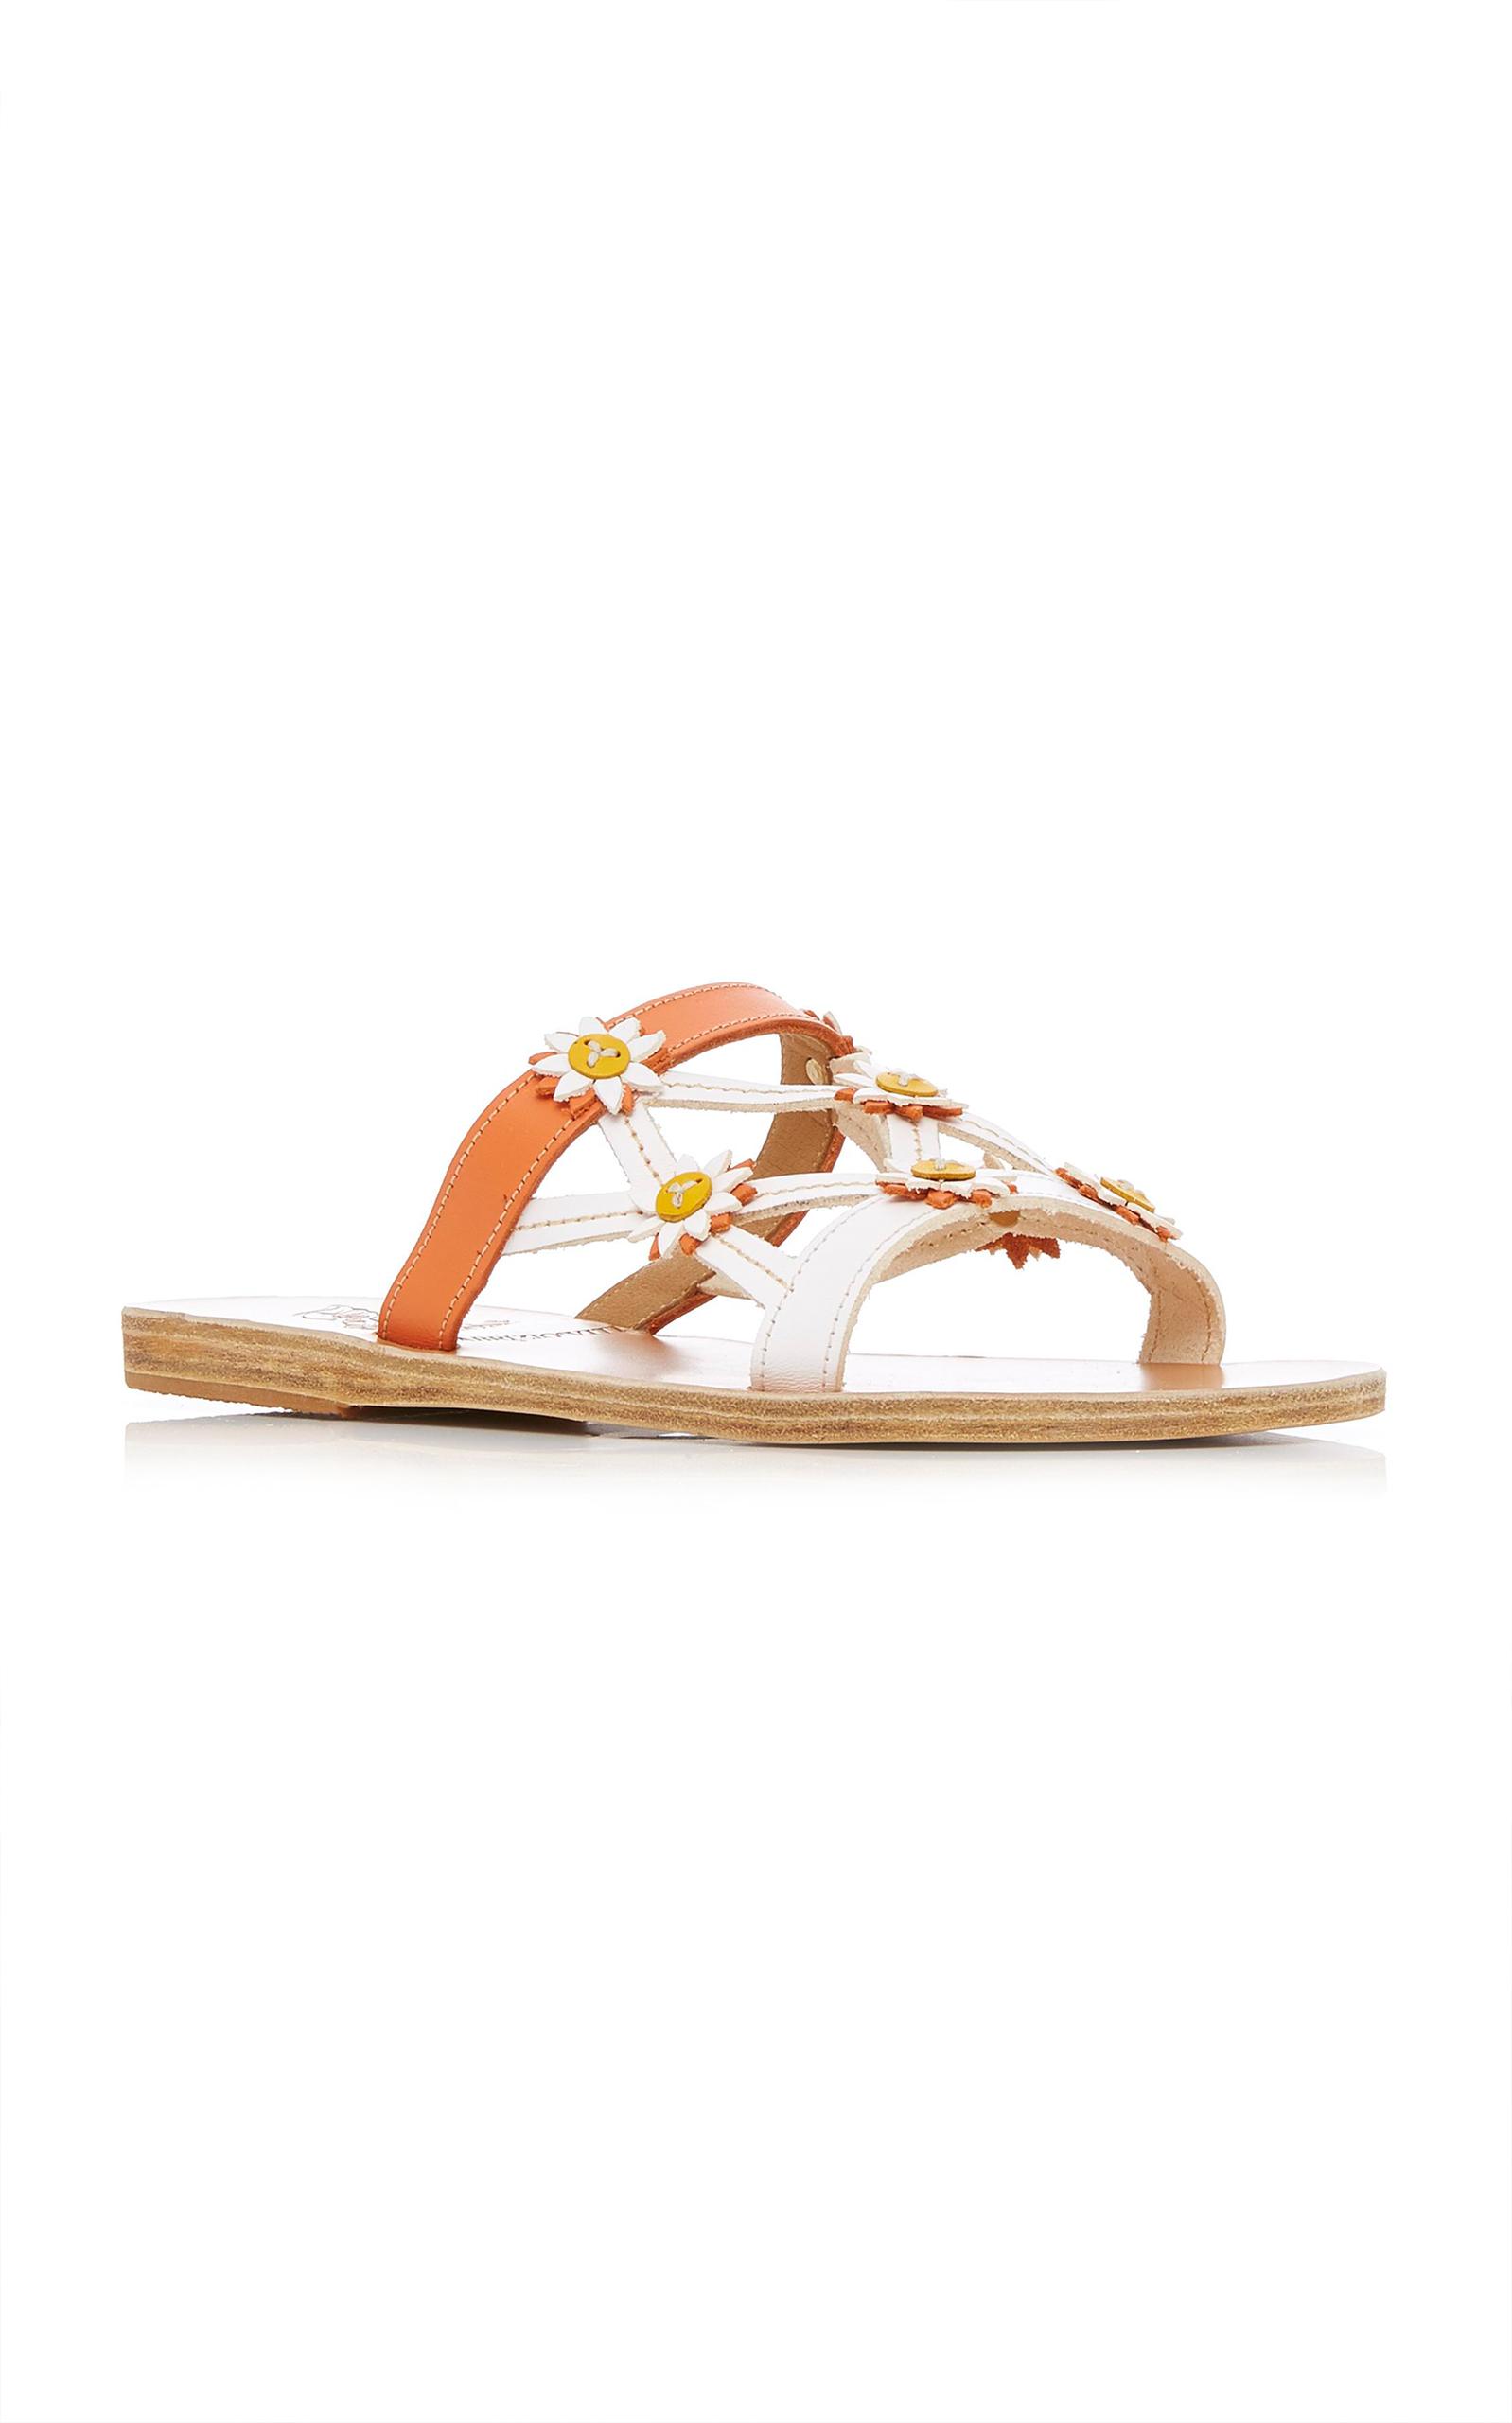 Peonia Floral-Embellished Leather Sandals Ancient Greek Sandals OEkRjQoLS